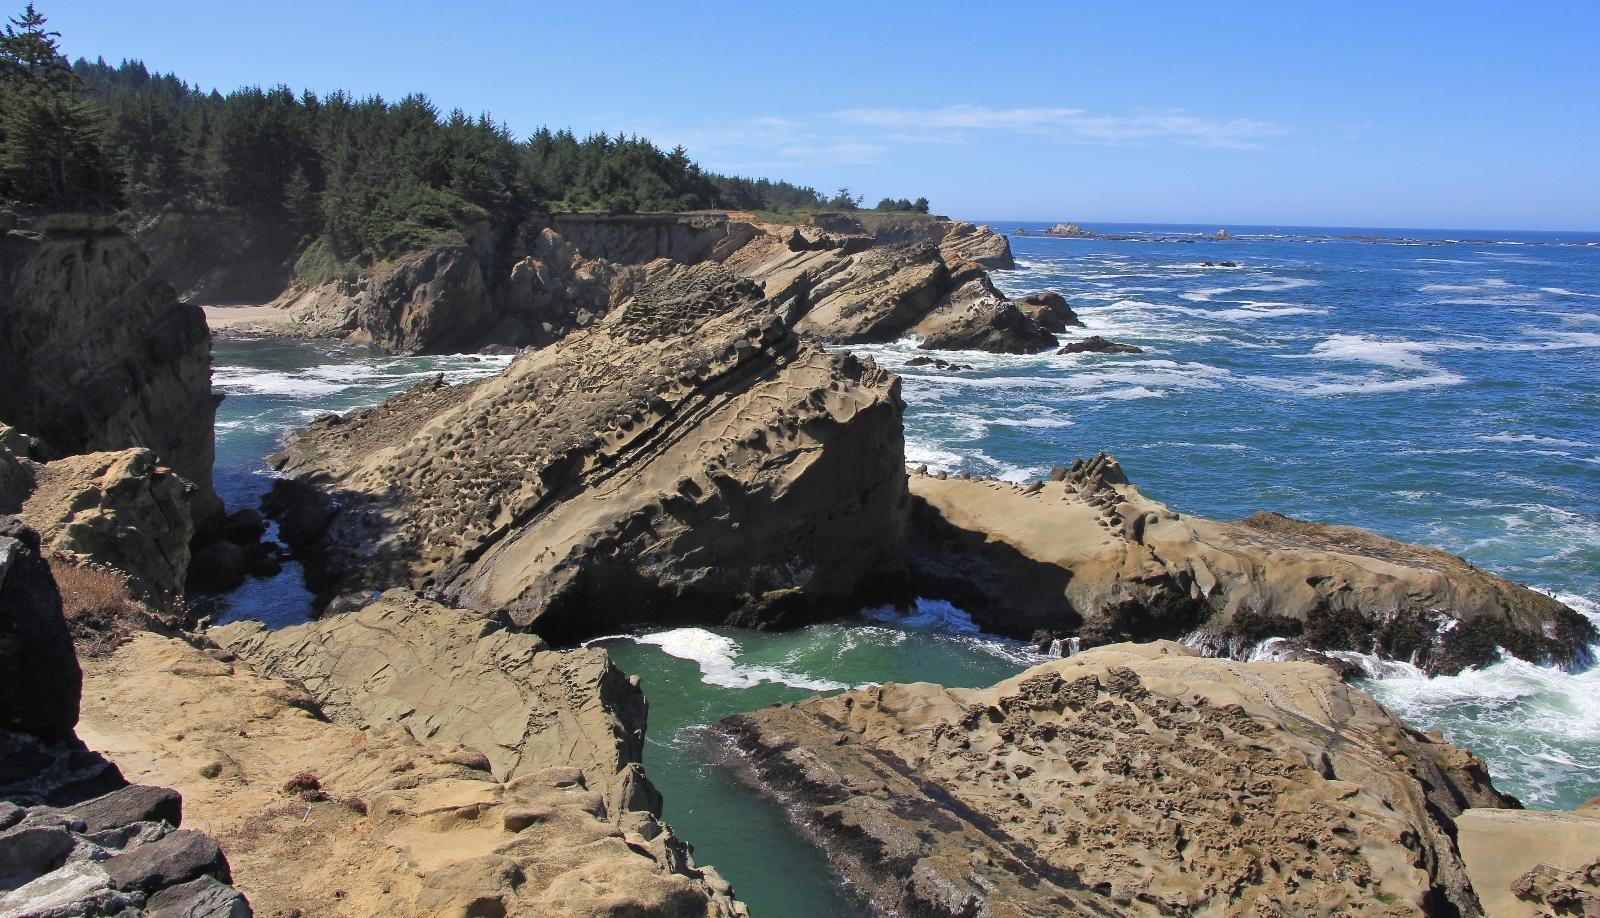 09-04-16-oregon-coast-shore-acres-105